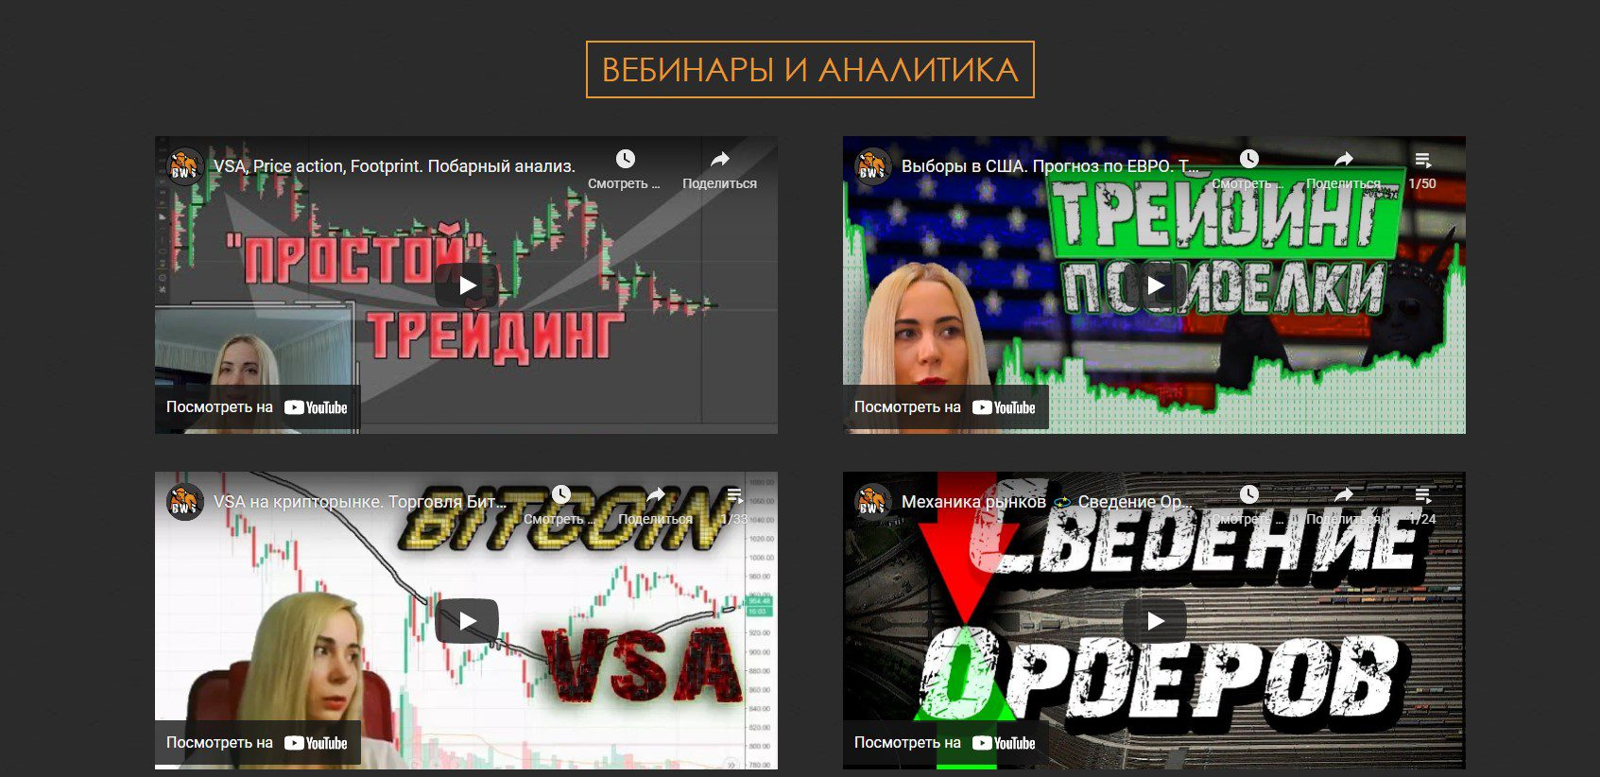 мария максимова вебинары и аналитика